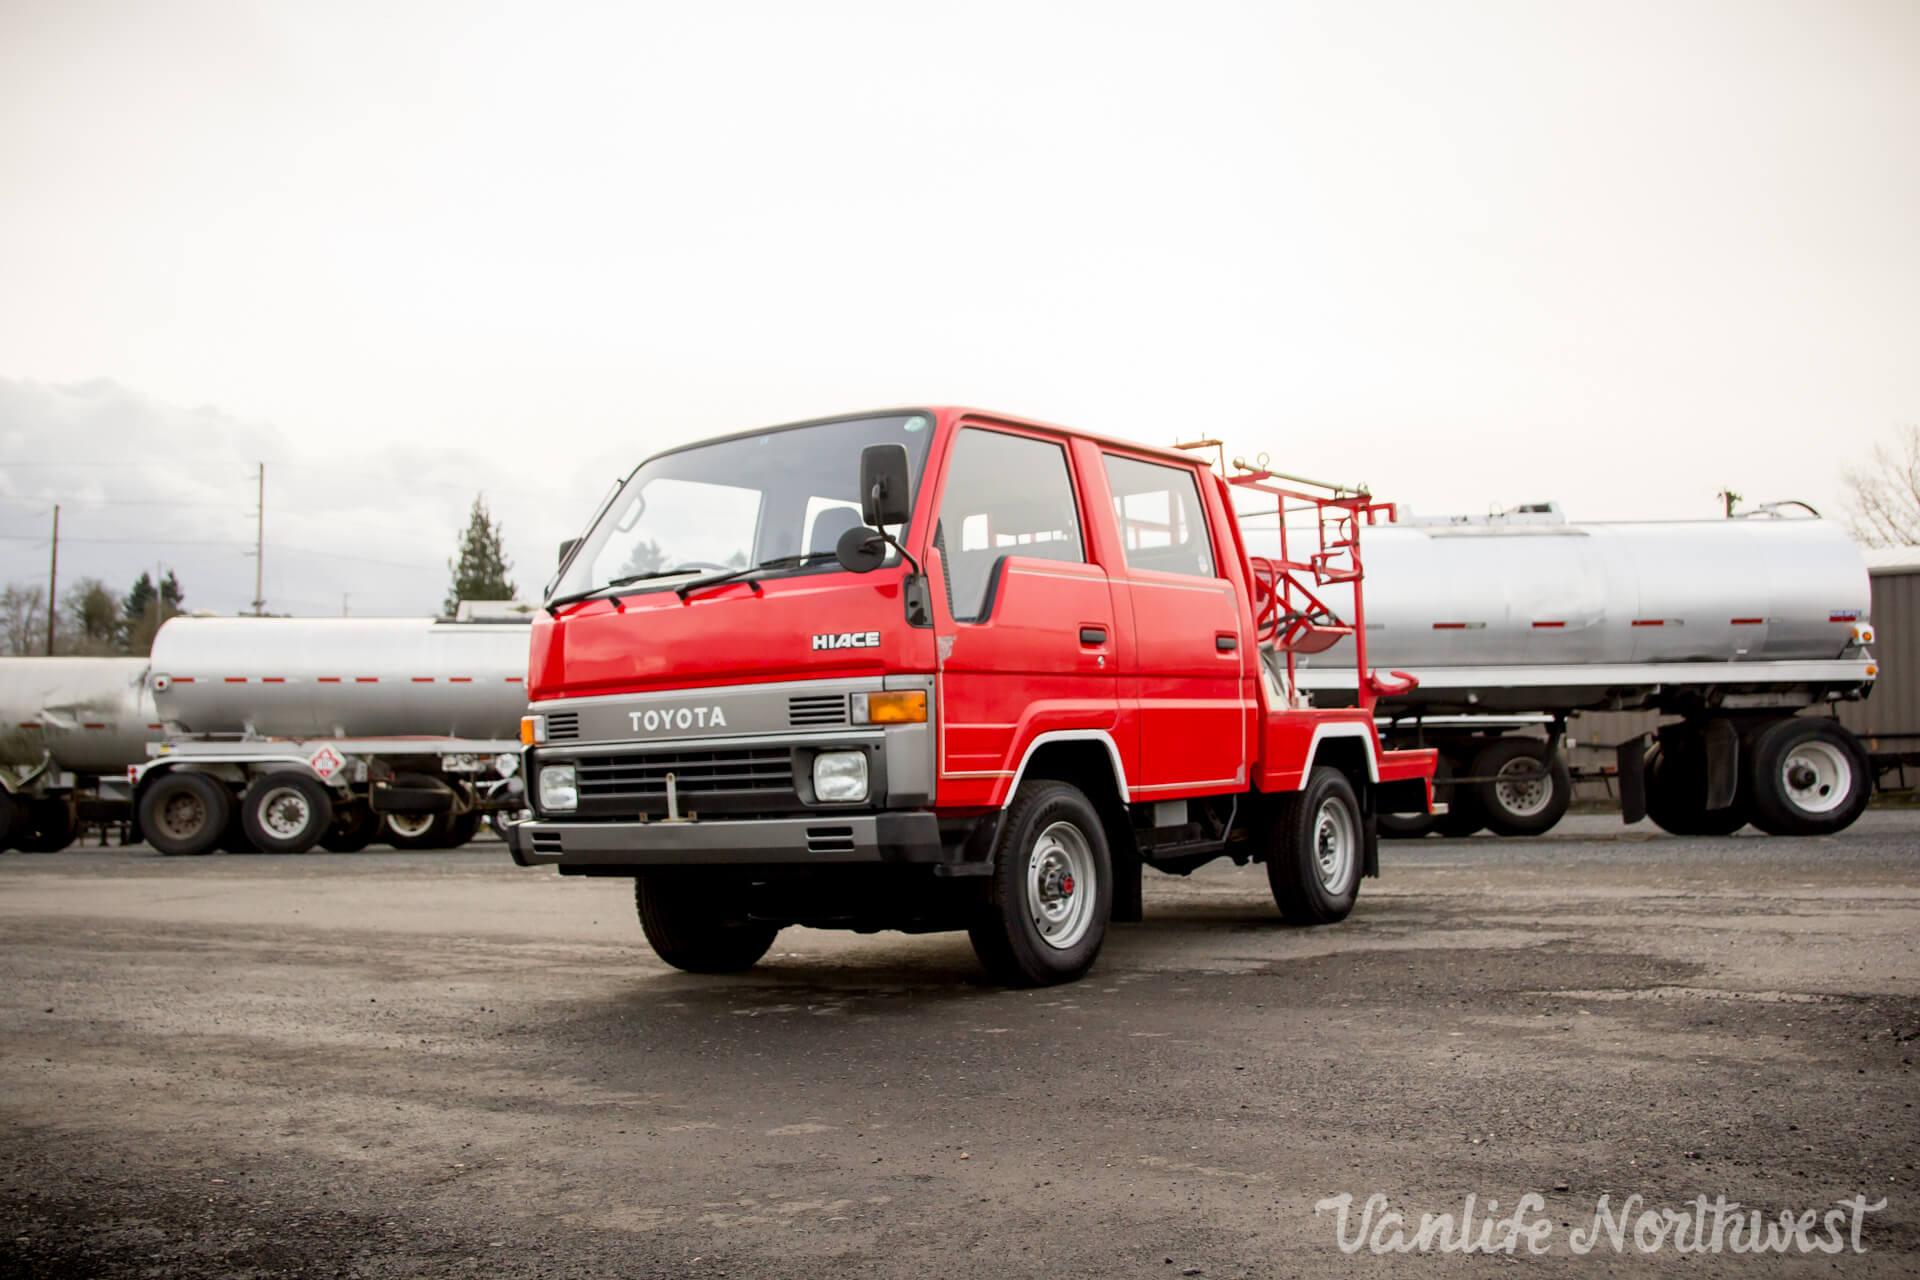 ToyotaHiaceFireTruckLH851990-9.jpg